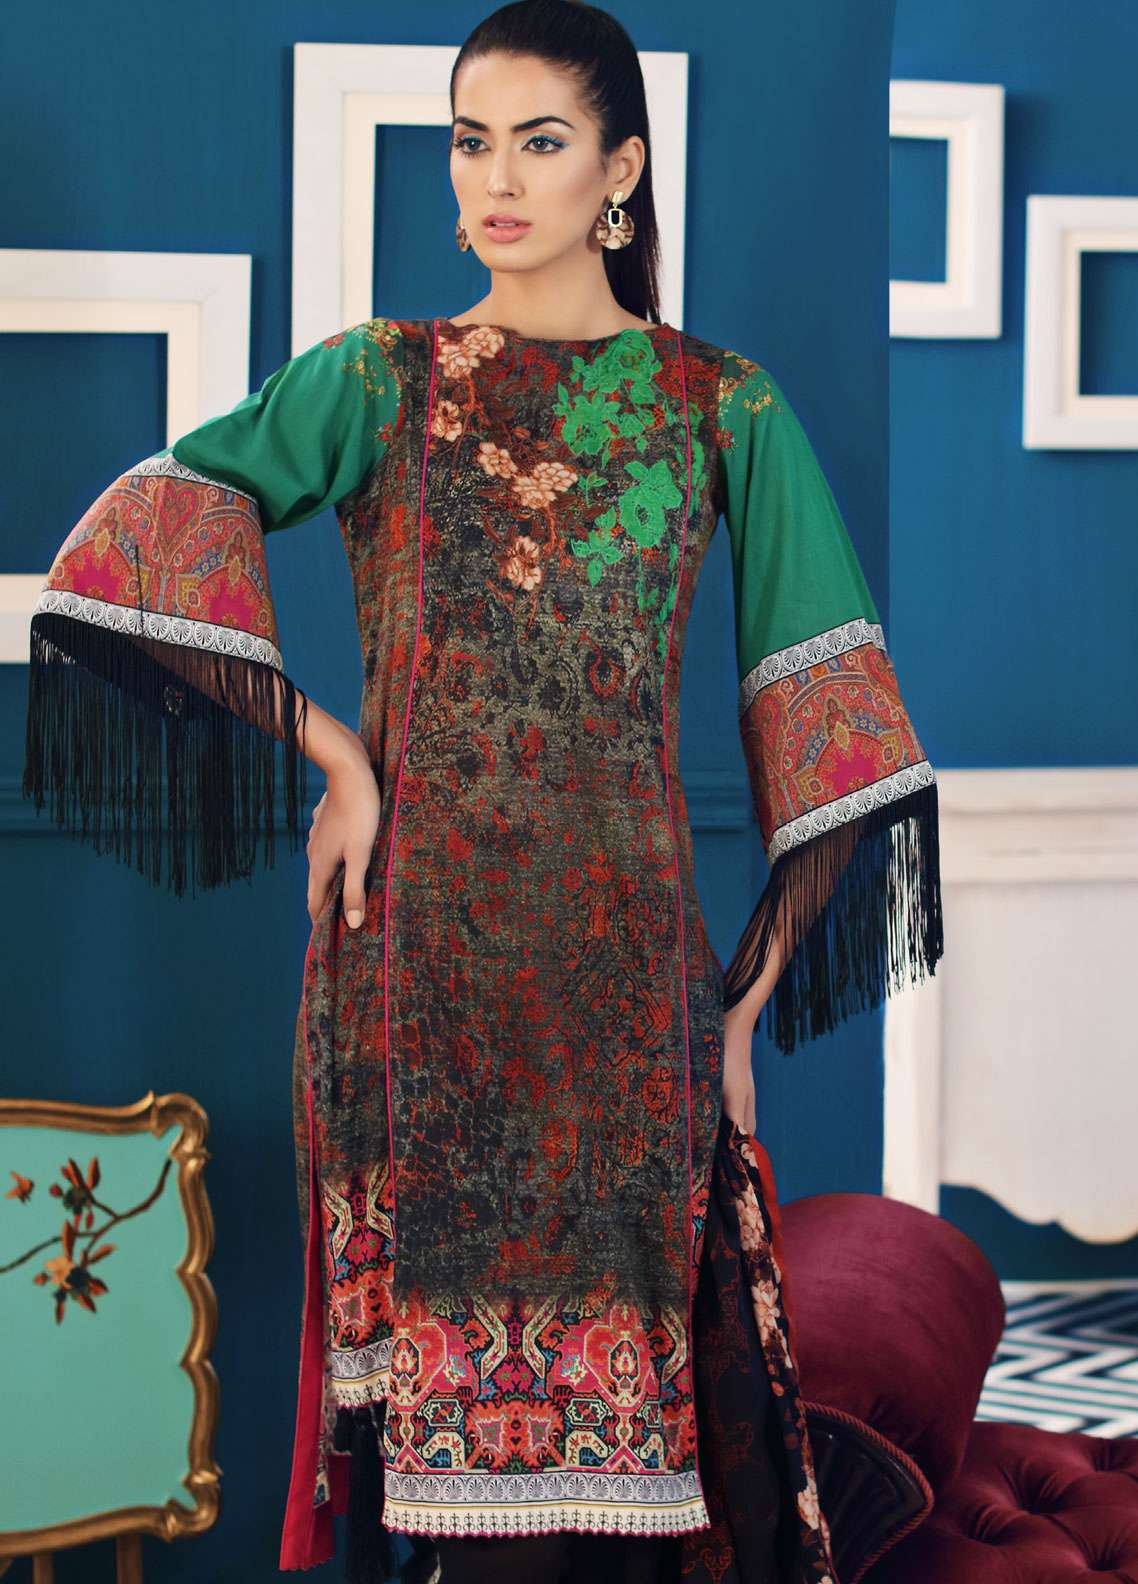 Al Zohaib Printed Lawn Unstitched 3 Piece Suit AZ19SA PS-13 - Spring / Summer Collection